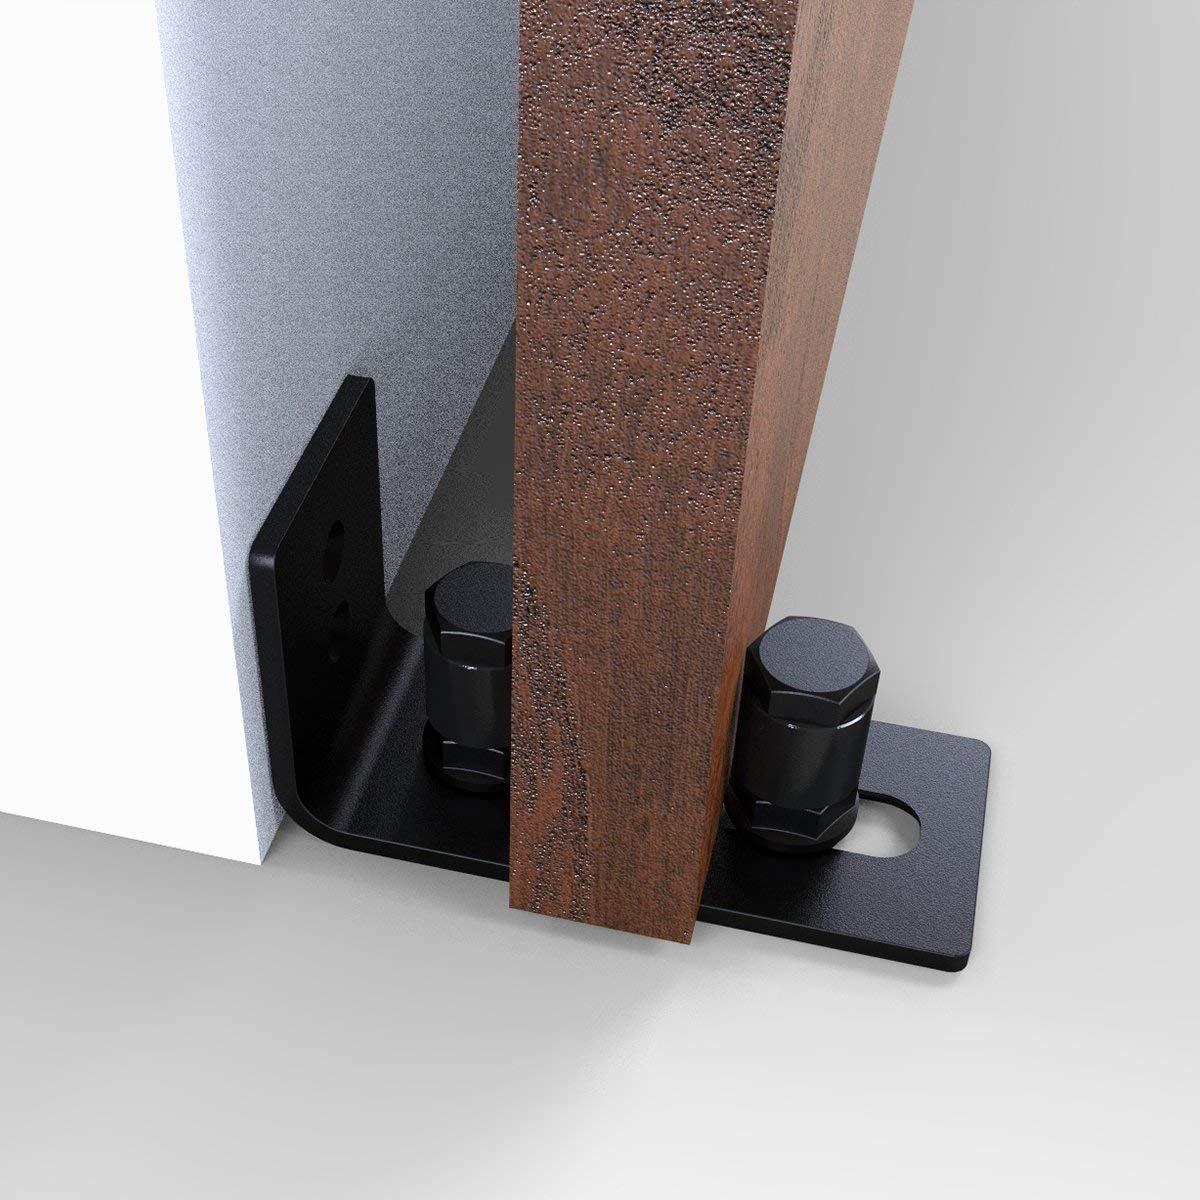 Barn Door Floor Guide Stay Roller - New Designed Stainless Sliding Door Hardware Adjustable Wall Mount Roller Guides for Pocket Door, Cabinets, Sliding Wood Doors (Black) by HOMEWINS (Image #6)